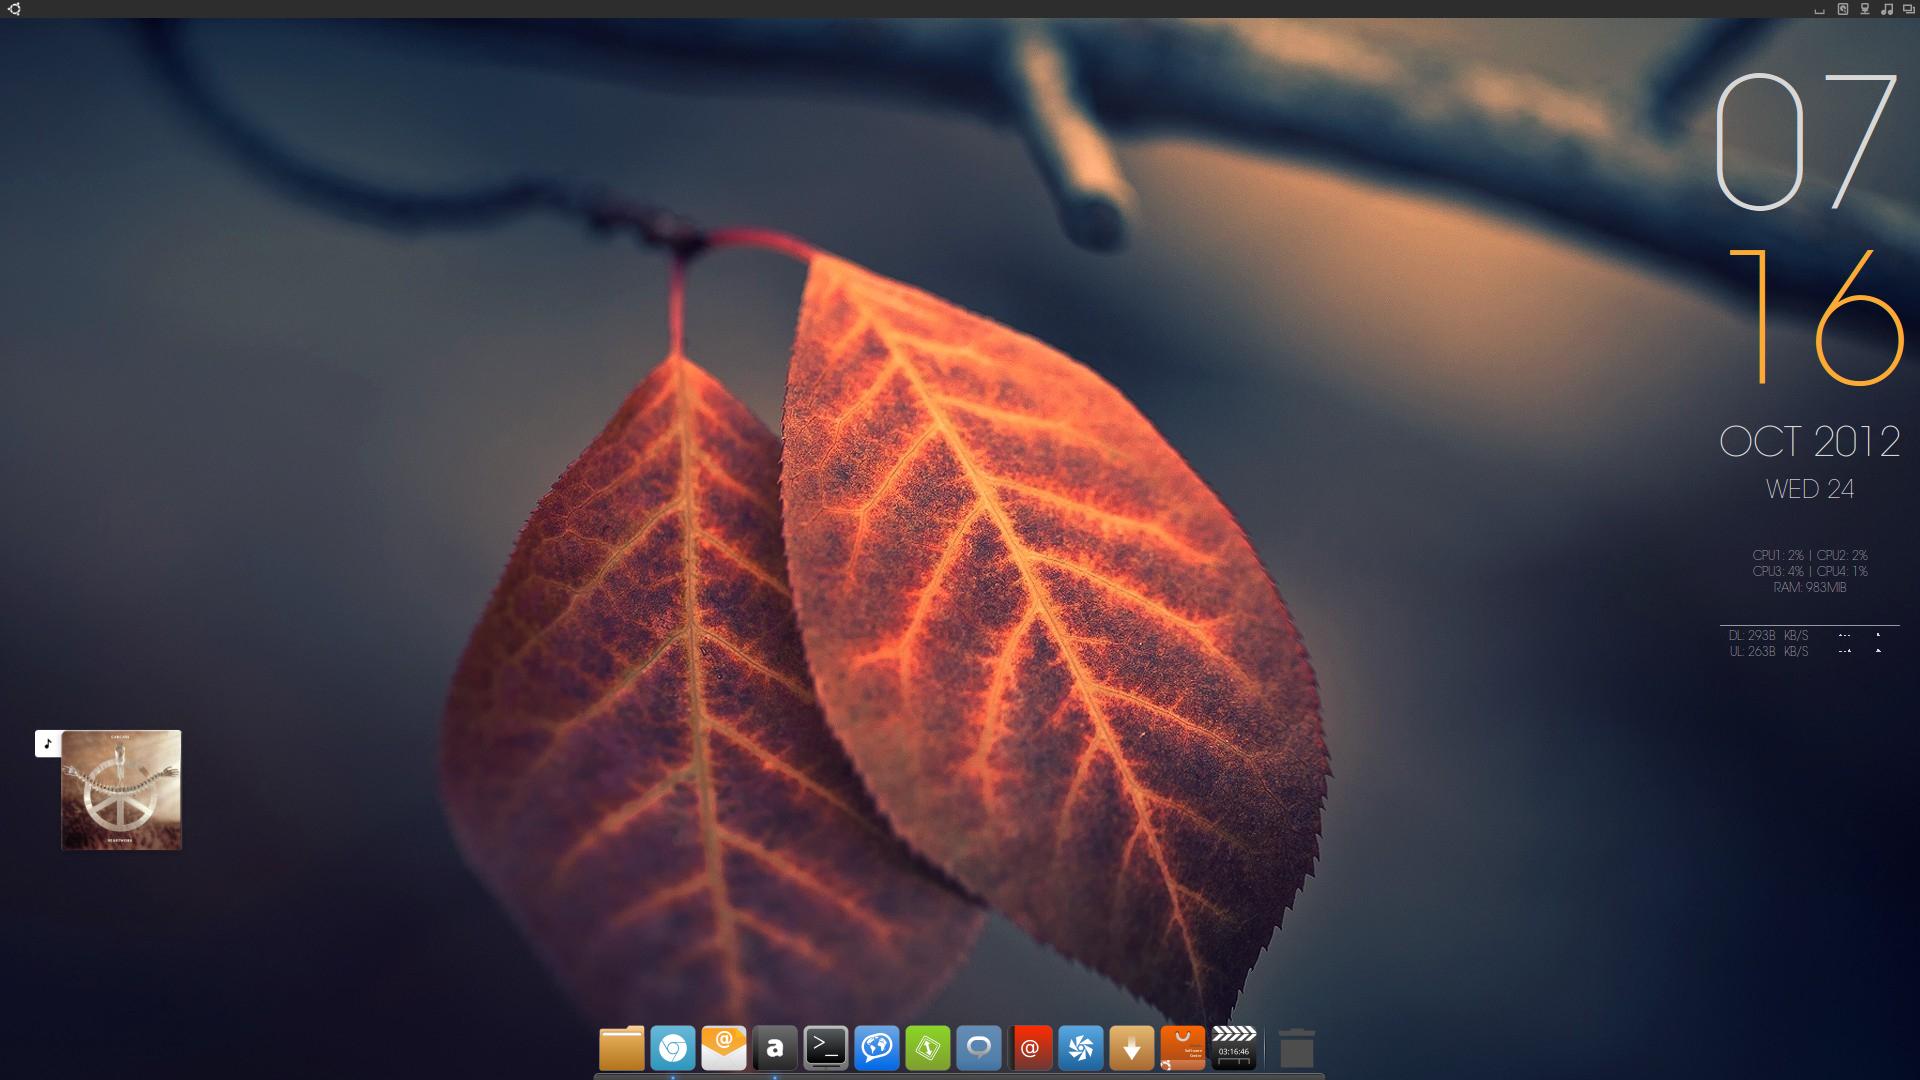 Leafy Cinnamon by Dobbie03